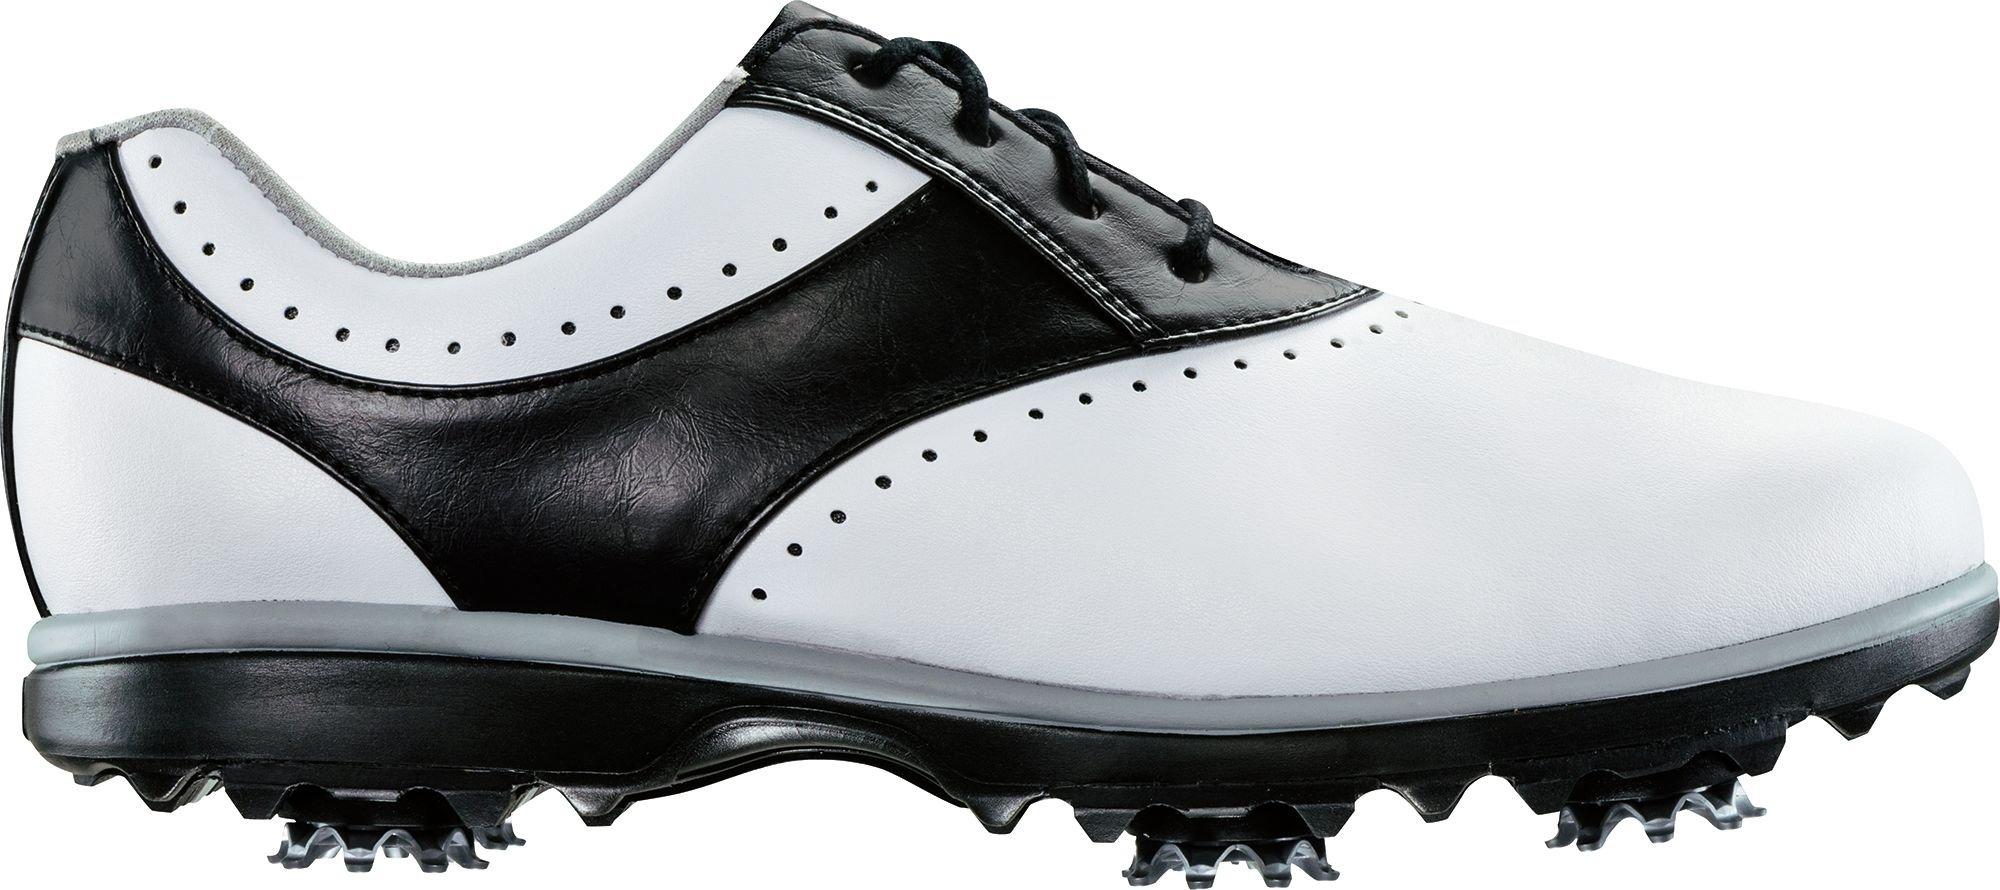 FootJoy Women's eMerge Closeout Golf Shoes 93900 (White/Black, 6.5)